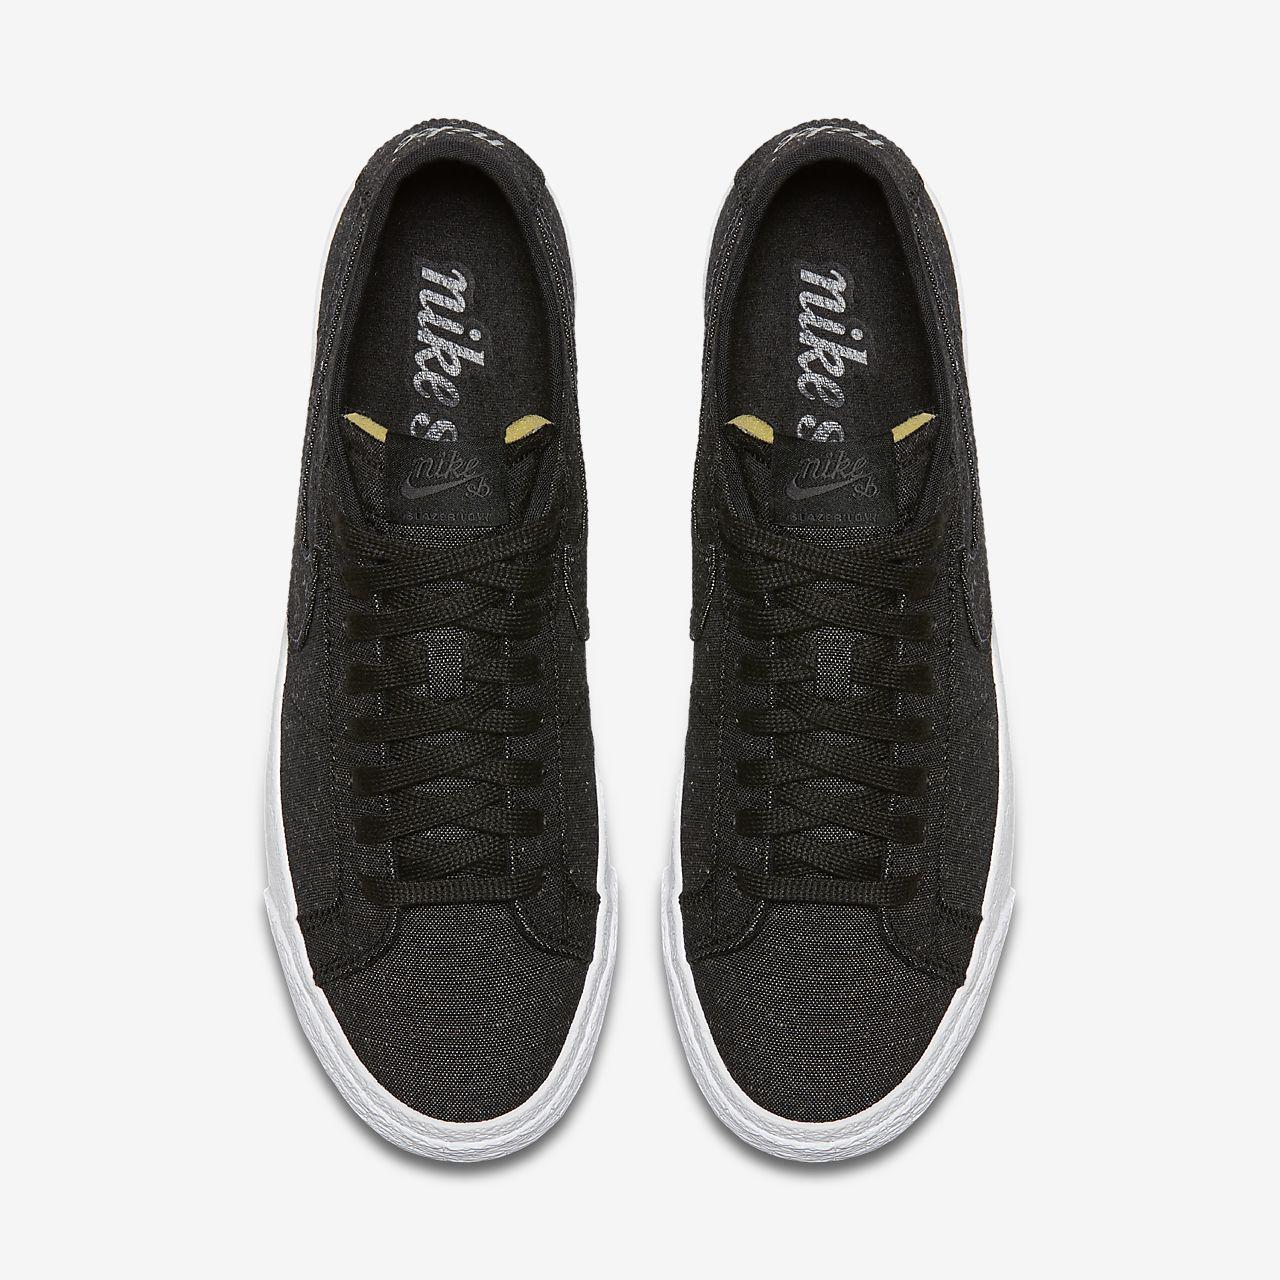 reputable site a99c2 36131 ... Nike SB Zoom Blazer Low Canvas Deconstructed Zapatillas de skateboard -  Hombre